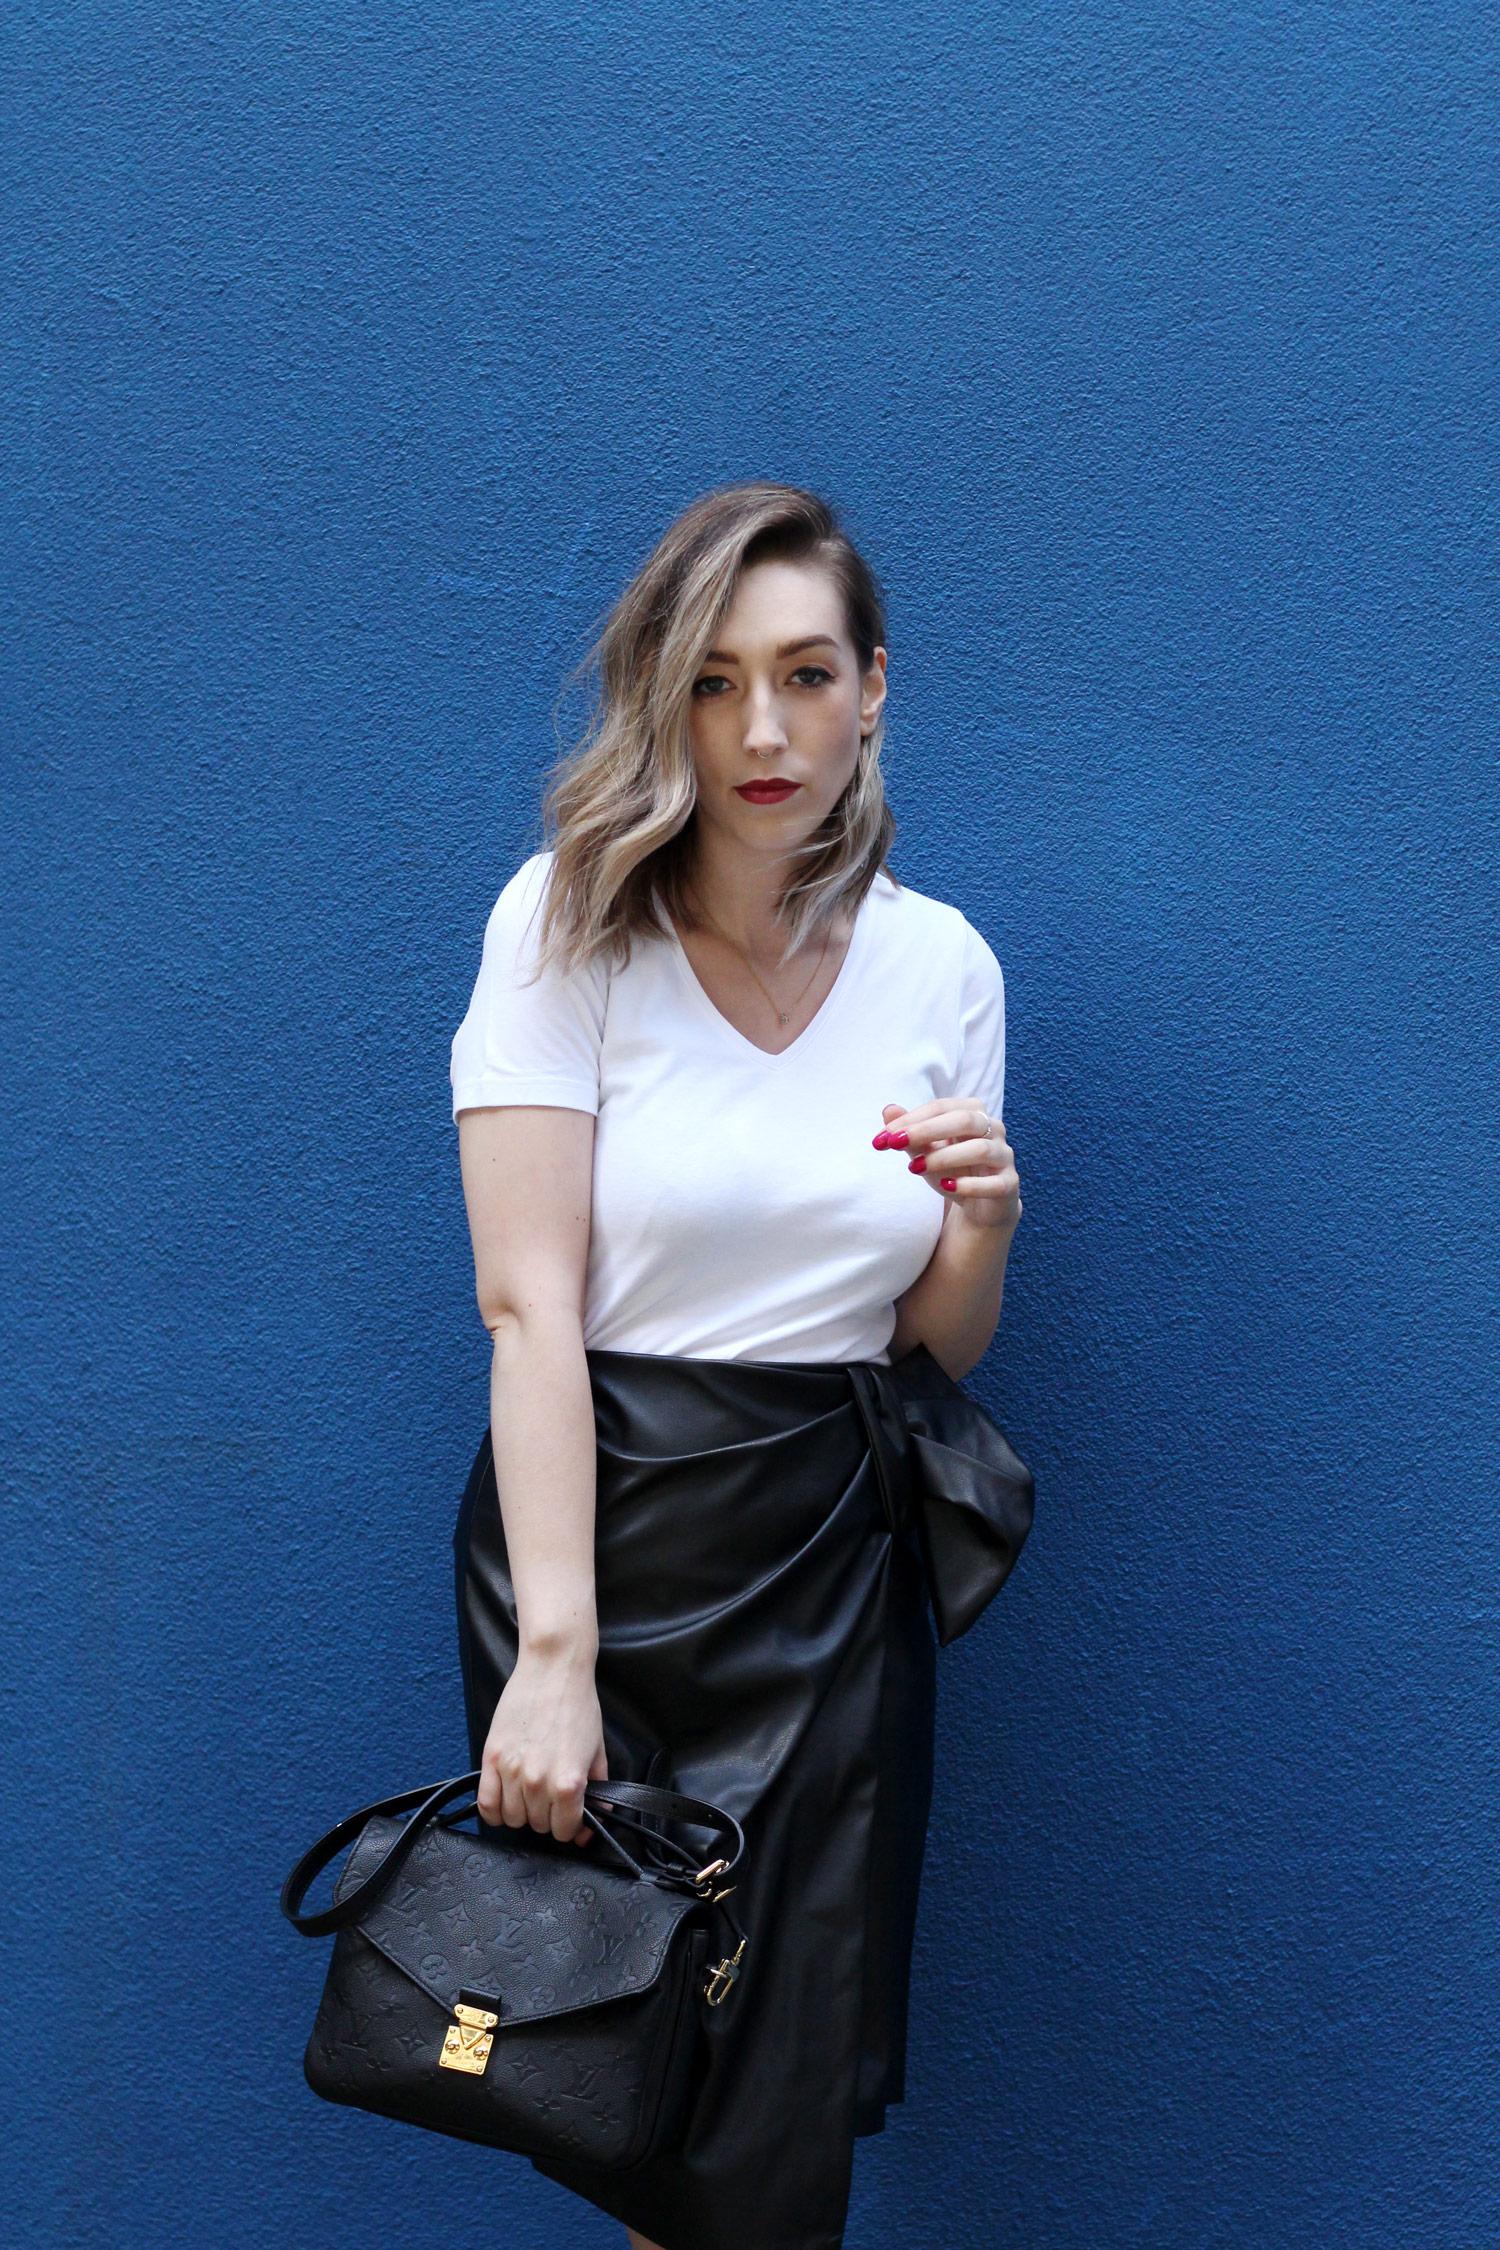 closet-london-leather-skirt-grey-cardgain-louis-vuitton-pochette-metis-10